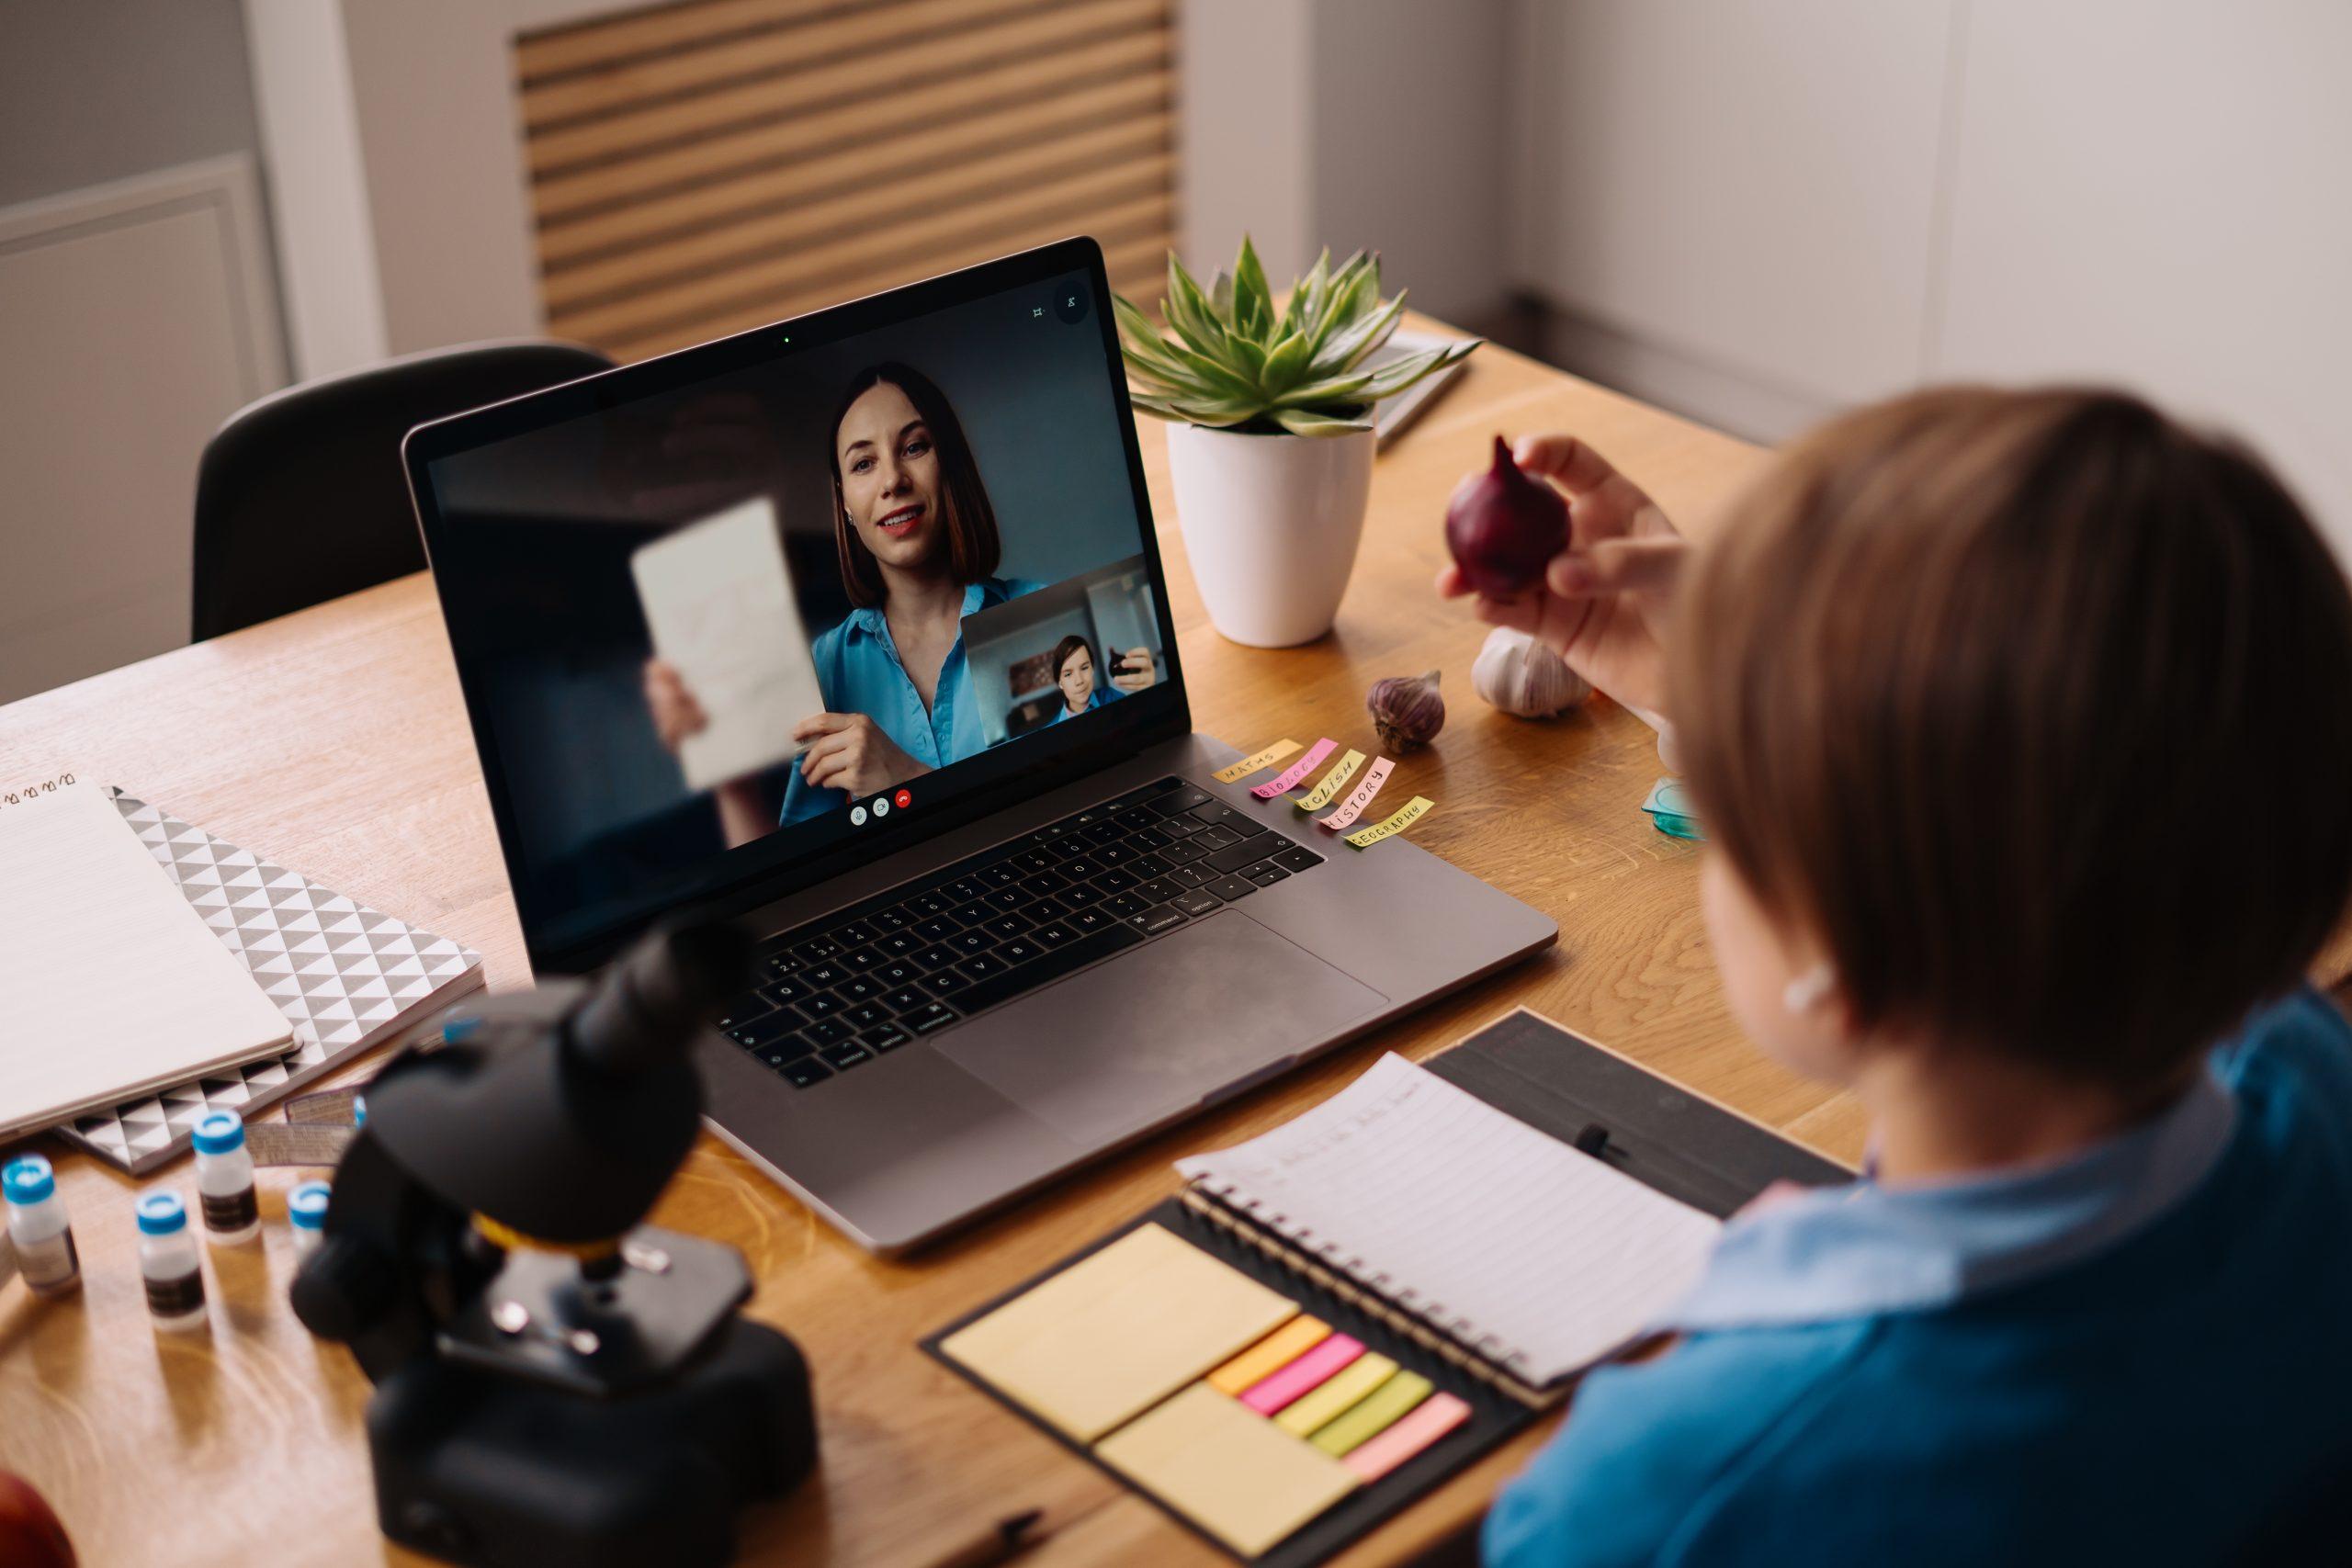 virtual learning amid pandemic | iTMunch